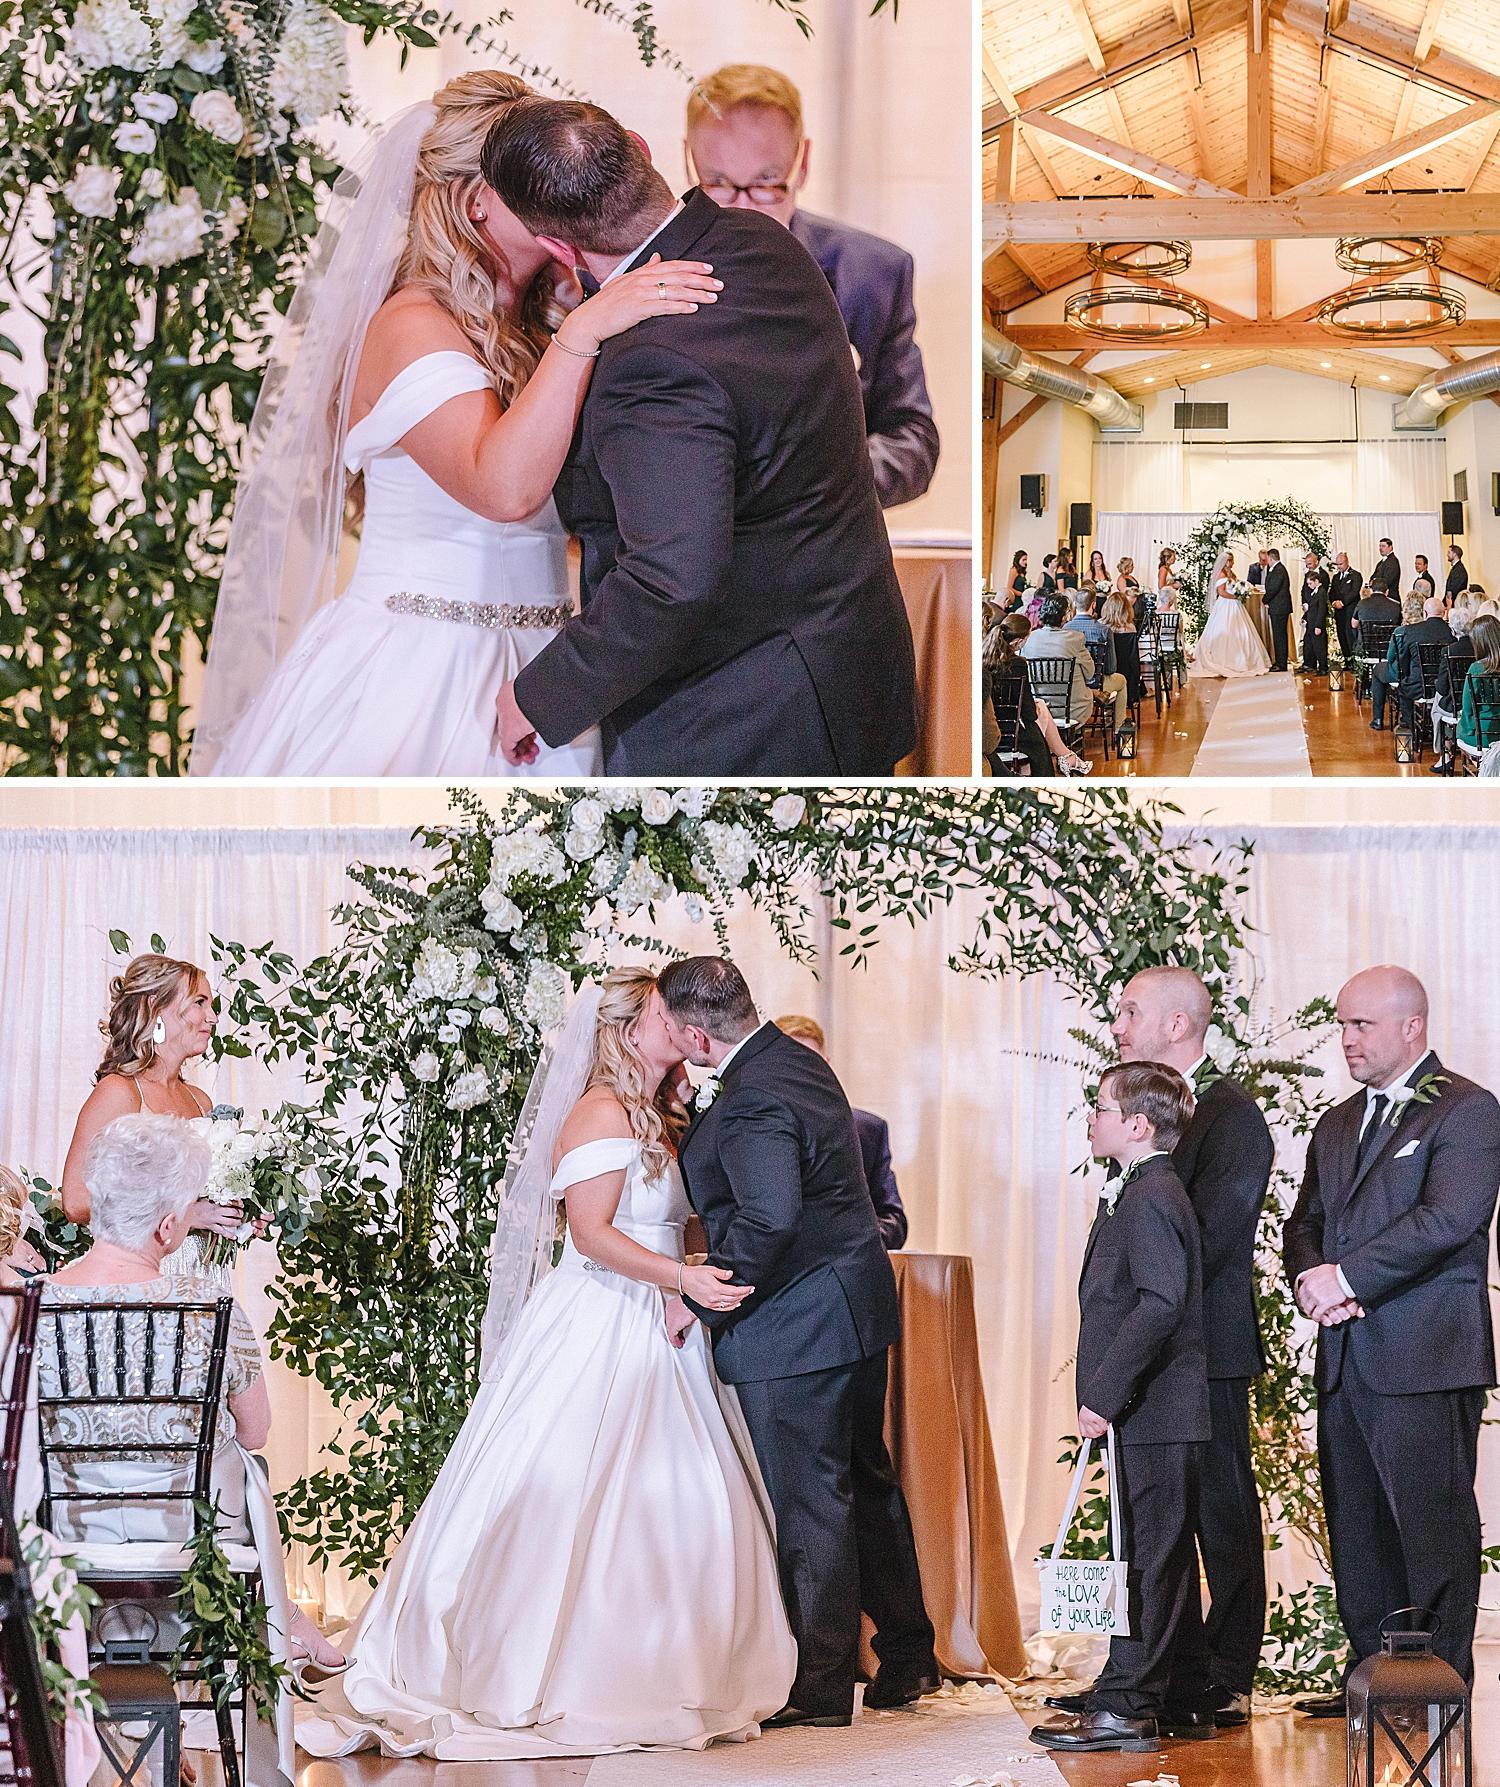 Magnolia-Halle-Wedding-San-Antonio-Texas-Bride-Grom_0057.jpg